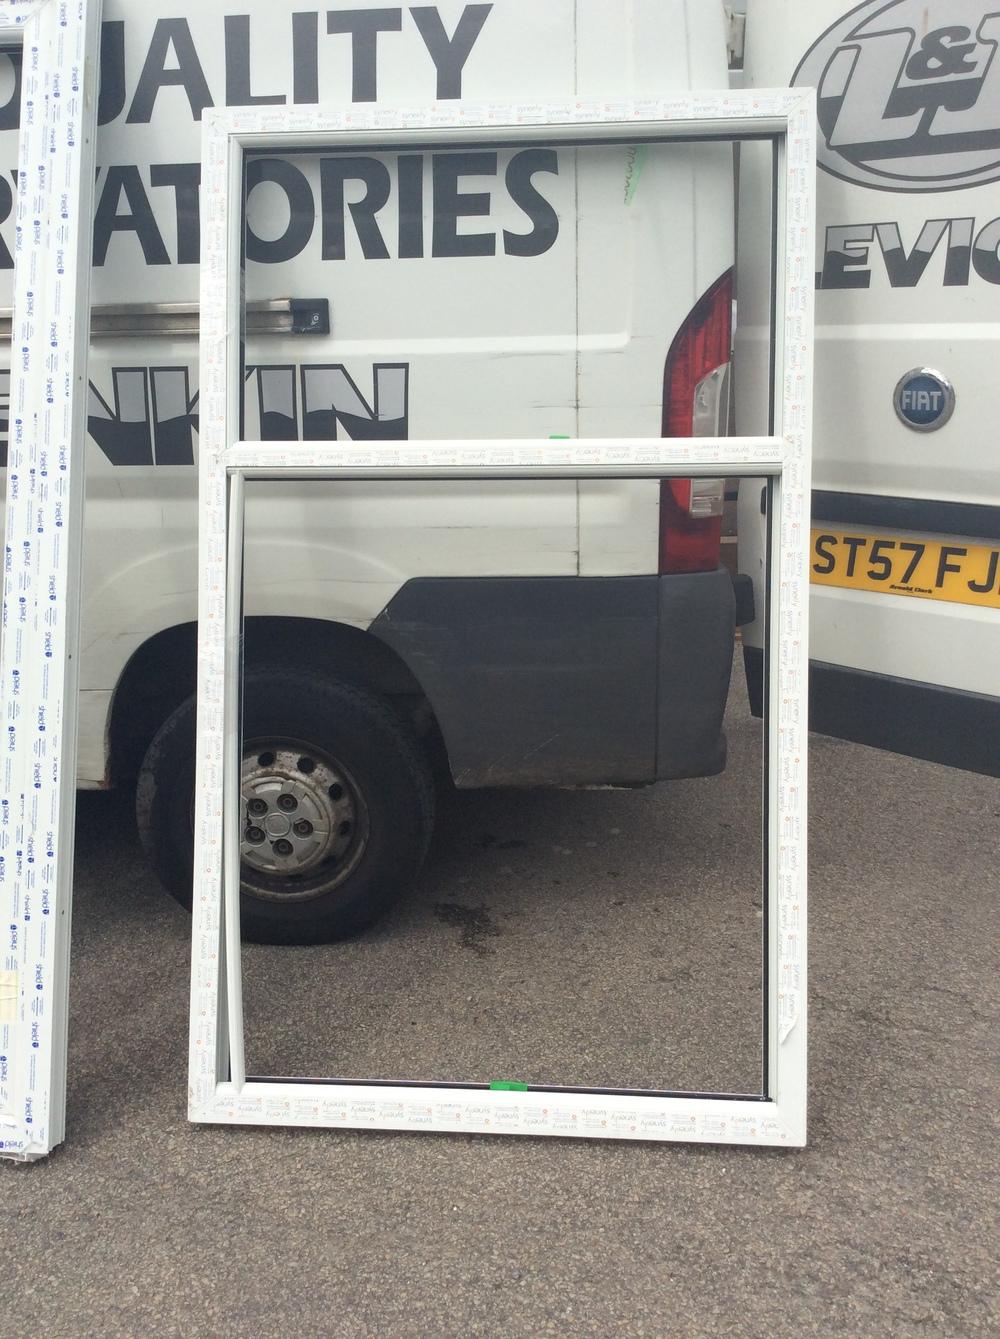 White uPVC fixed window 1125 mm wide x 1880 mm high £50 + VAT